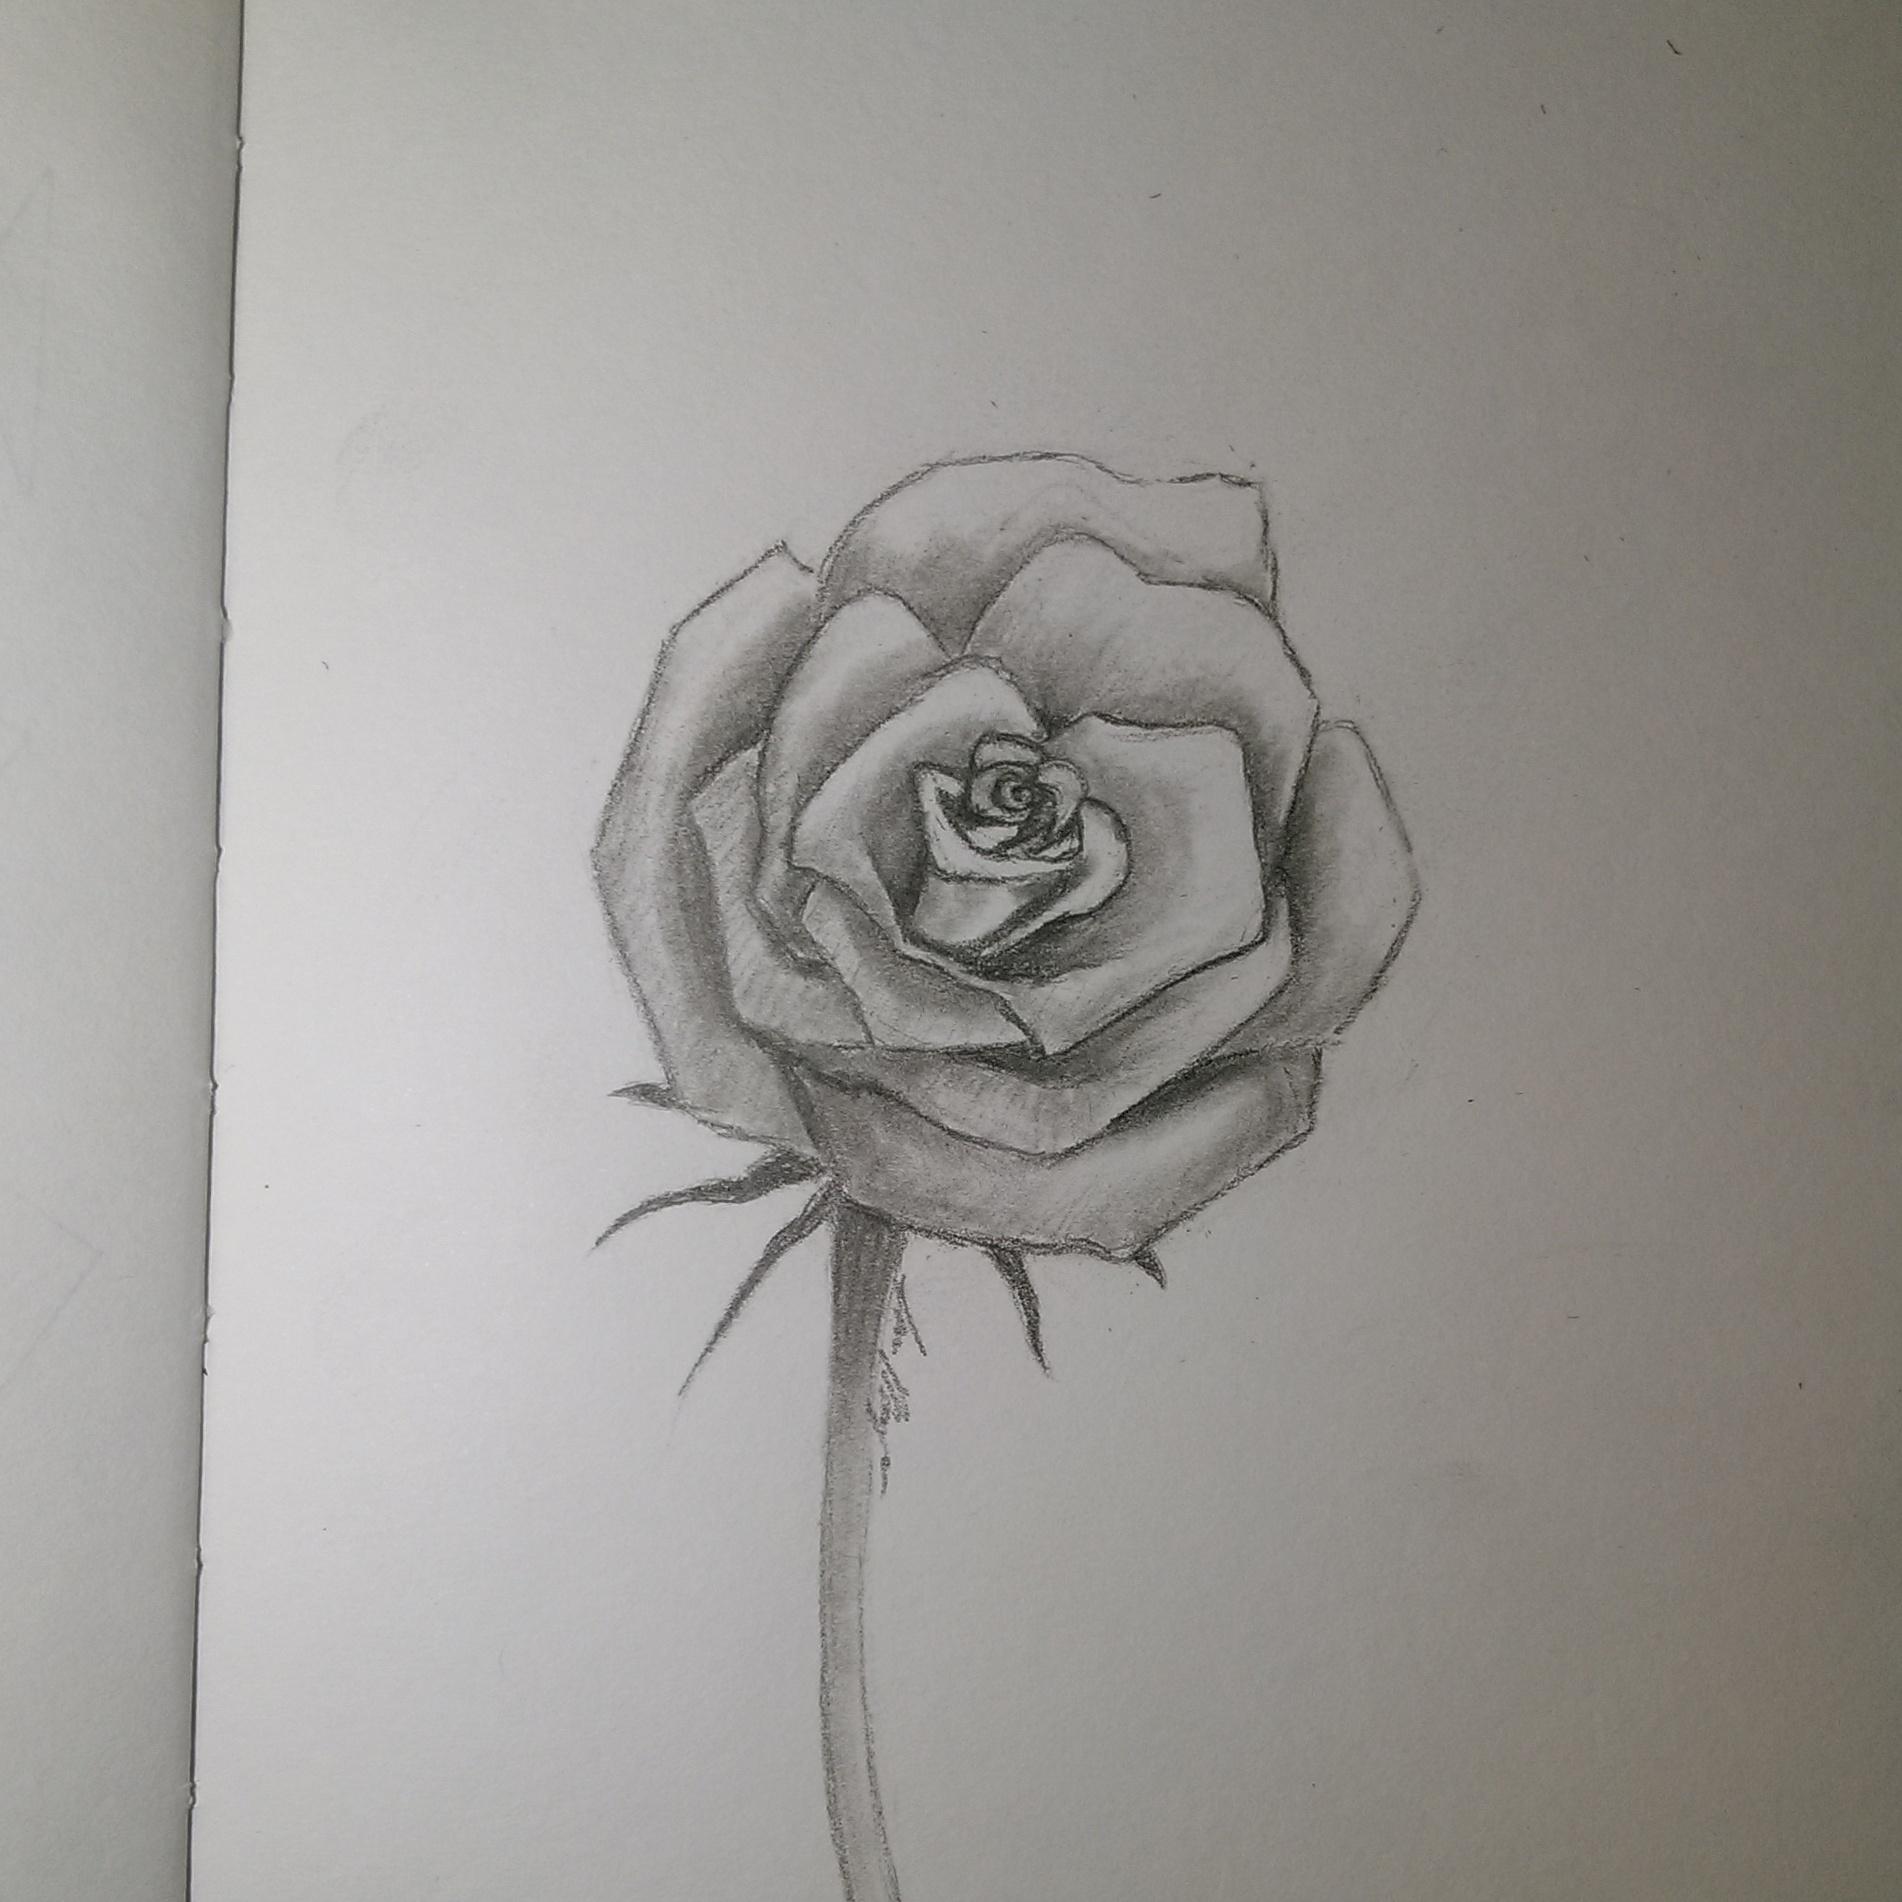 Drawn rose little rose Takukurosaki Download Step I Step